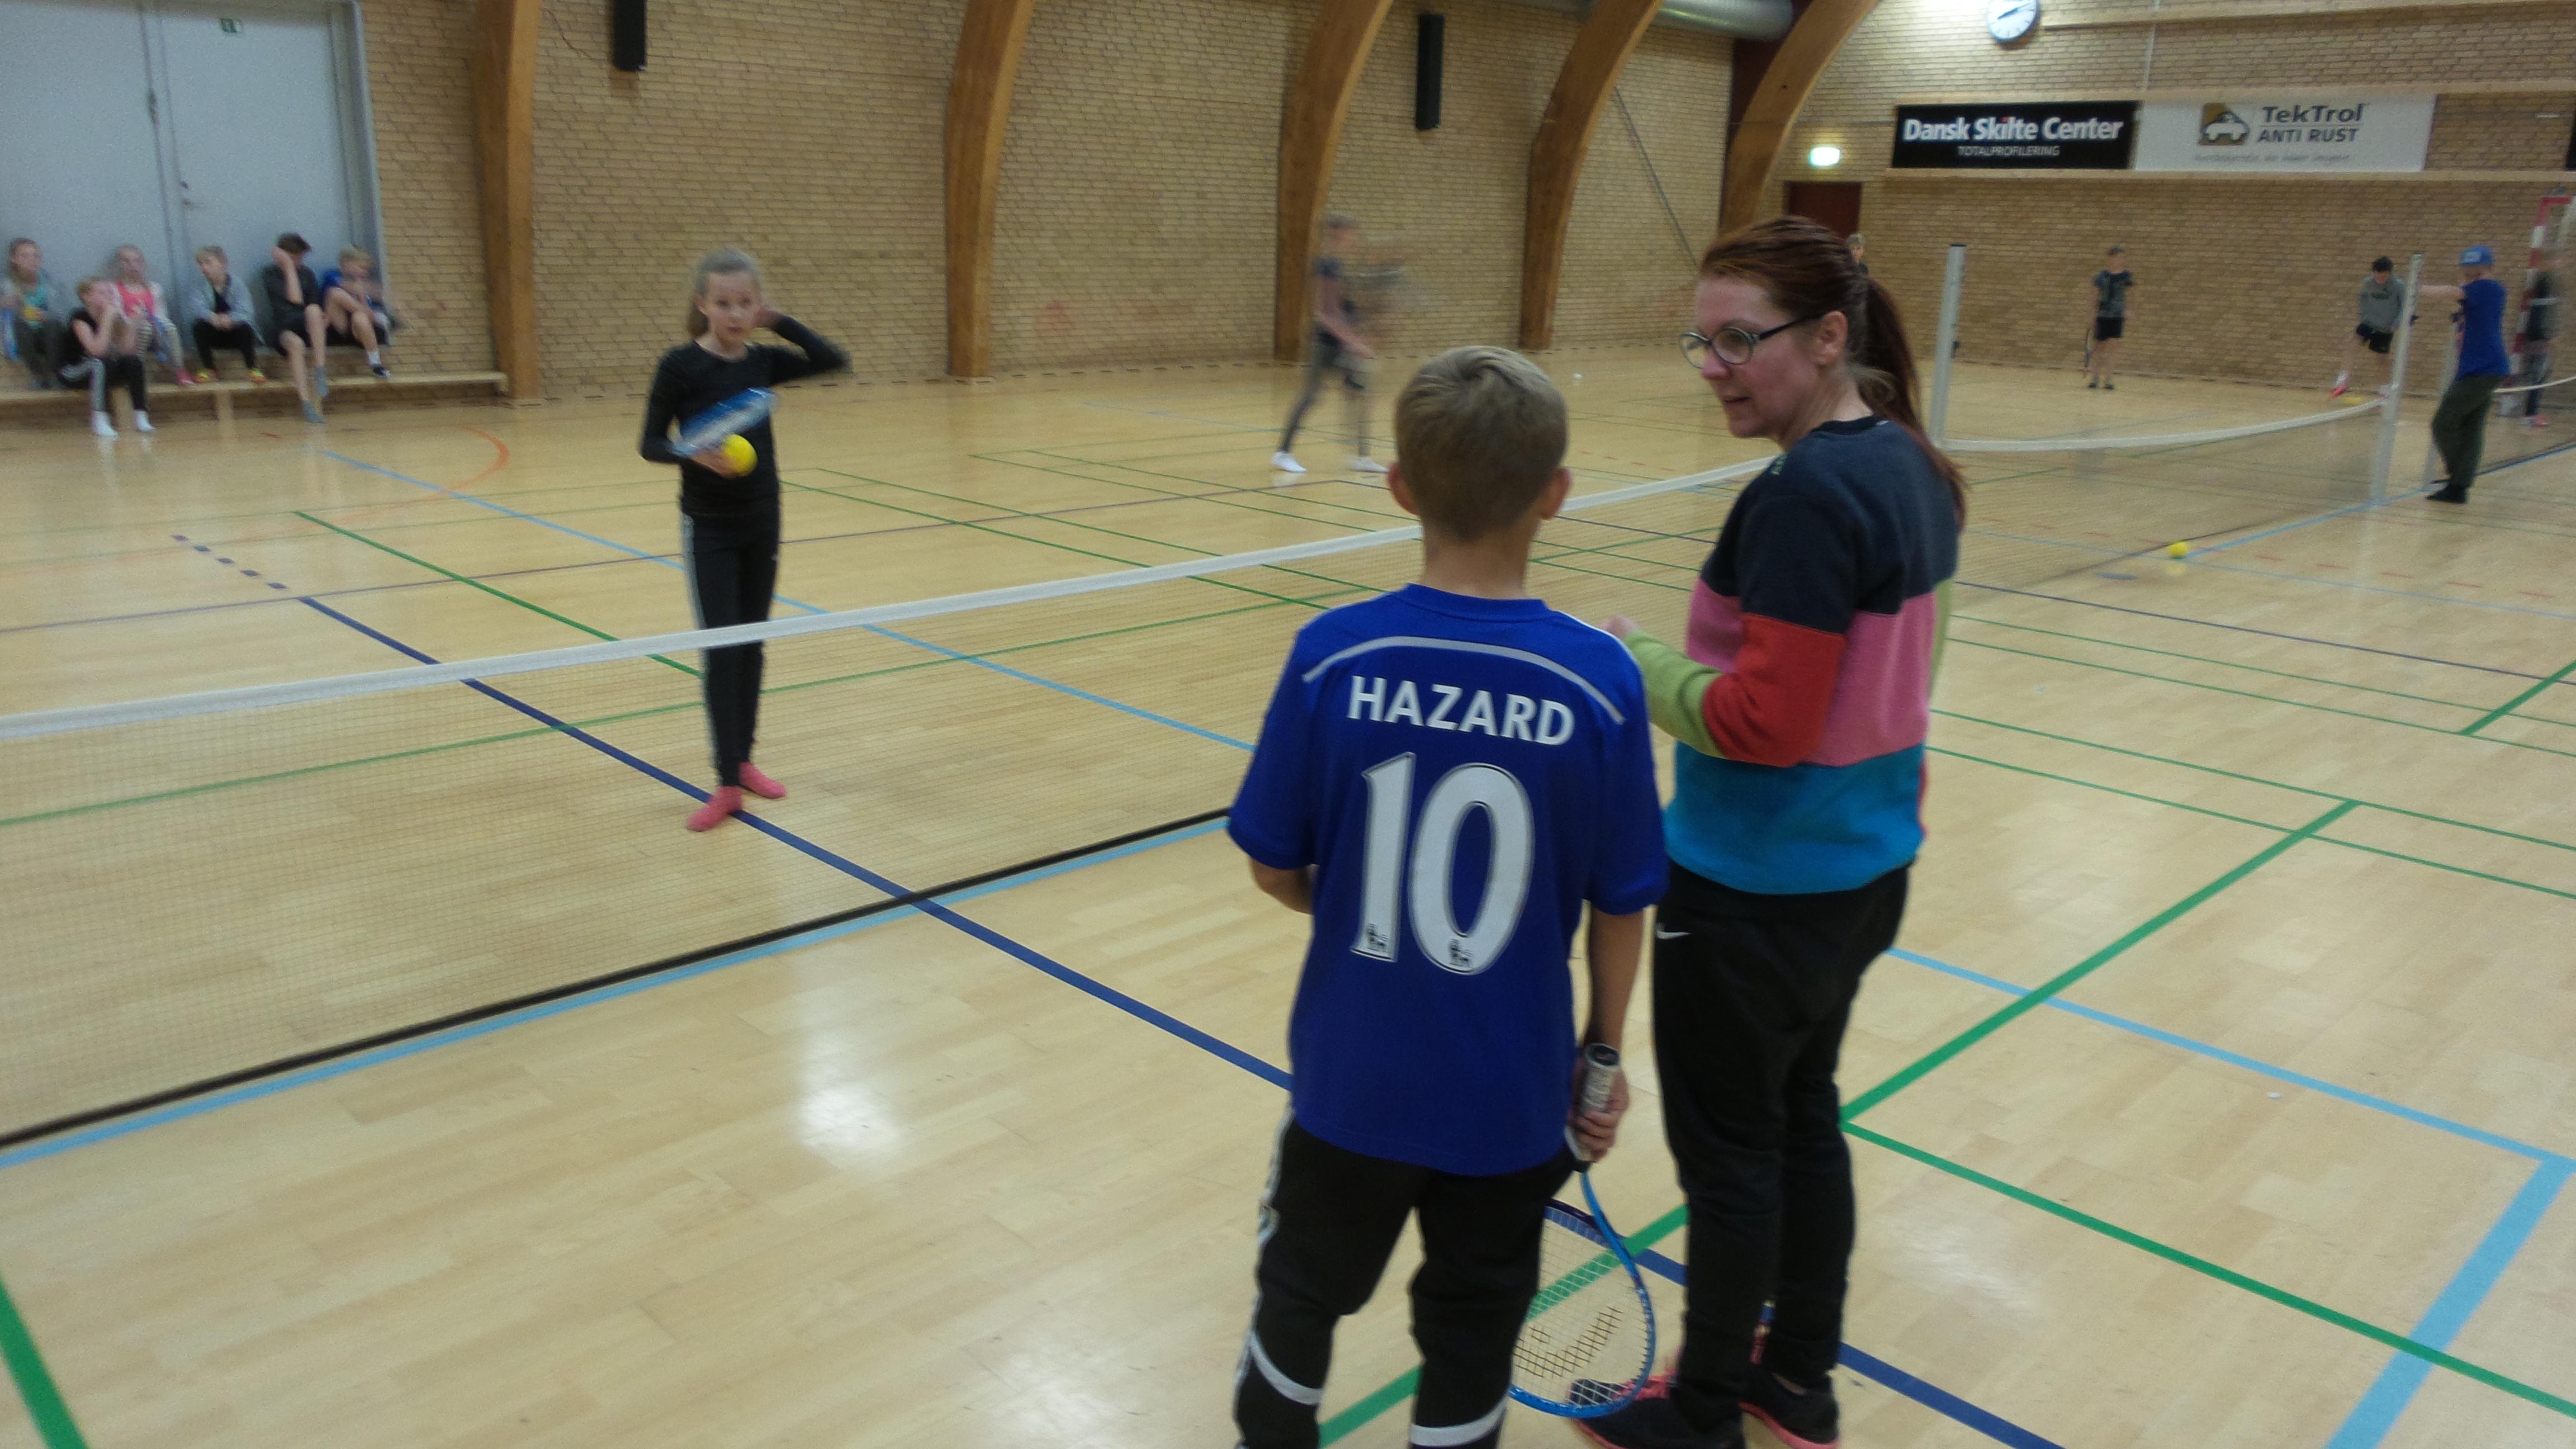 Stor skoletennis-turnering i Odense(3)